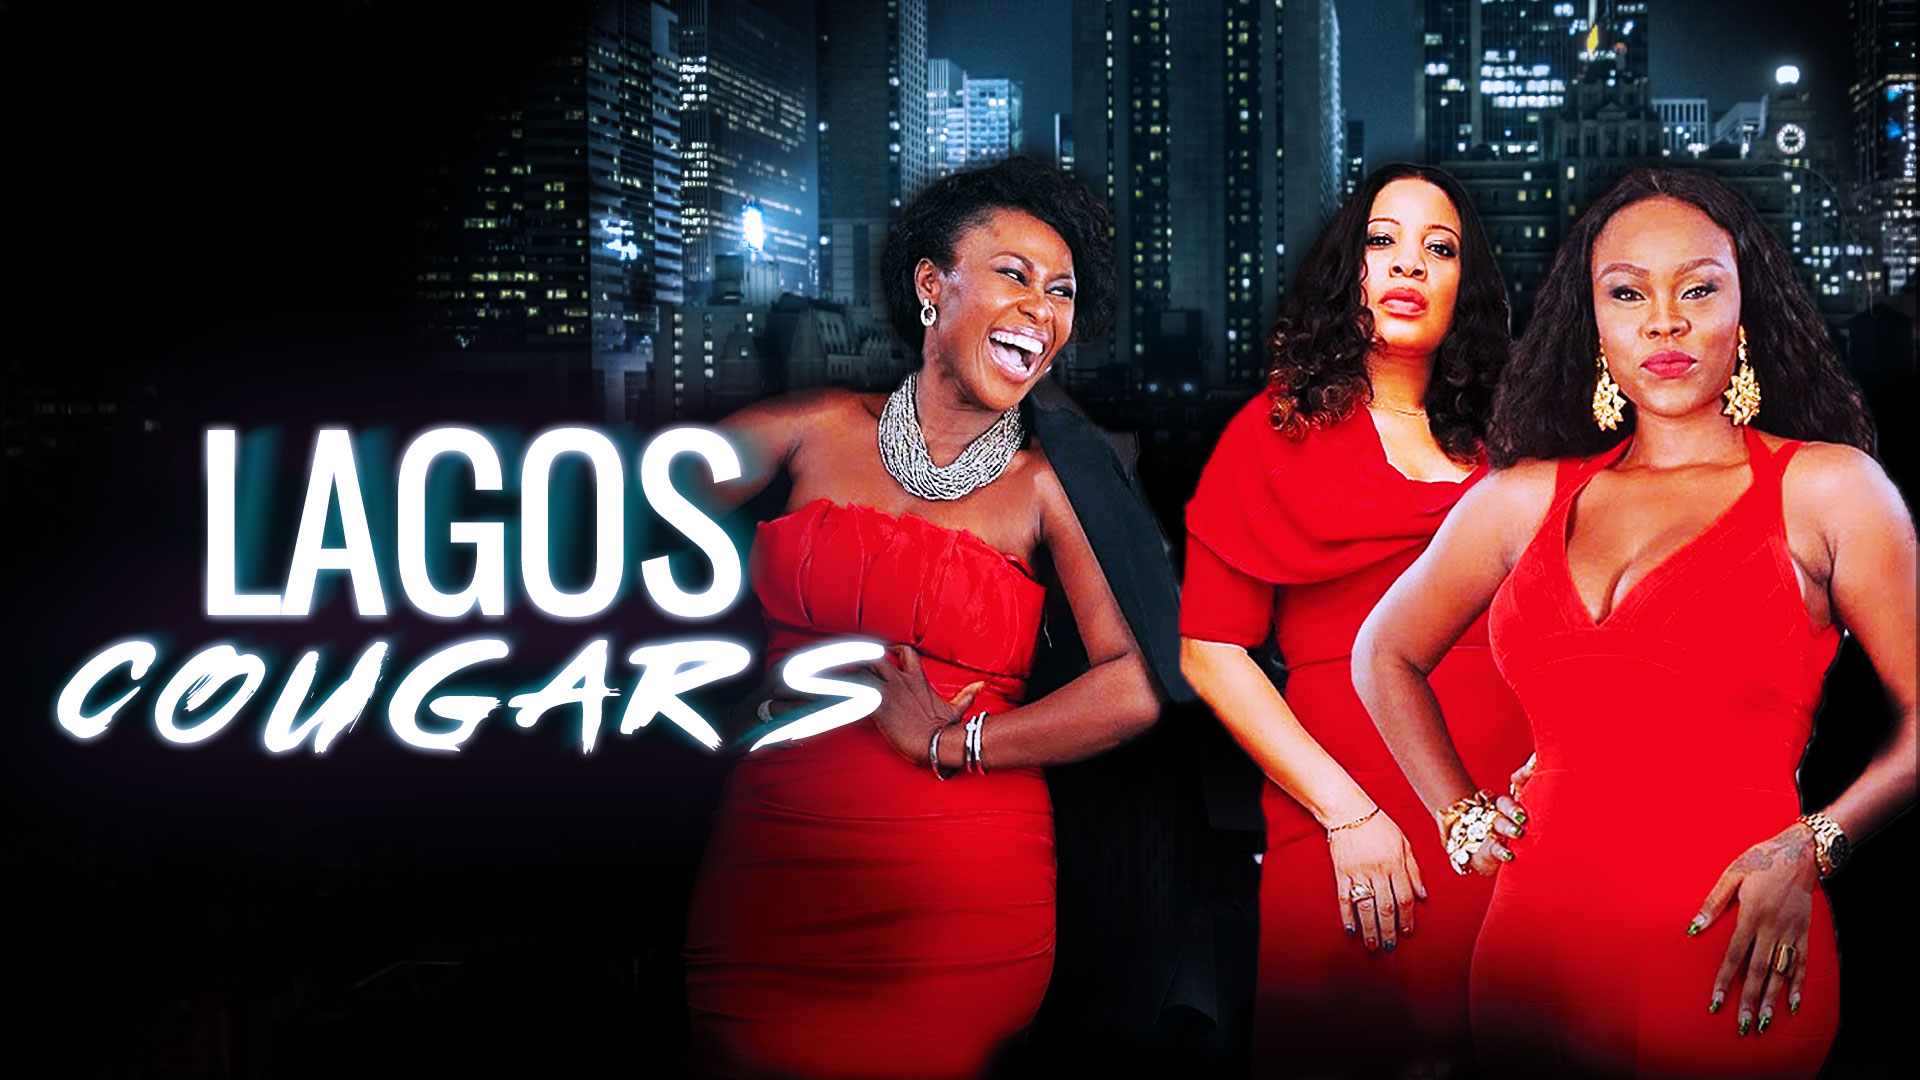 Lagos Cougars